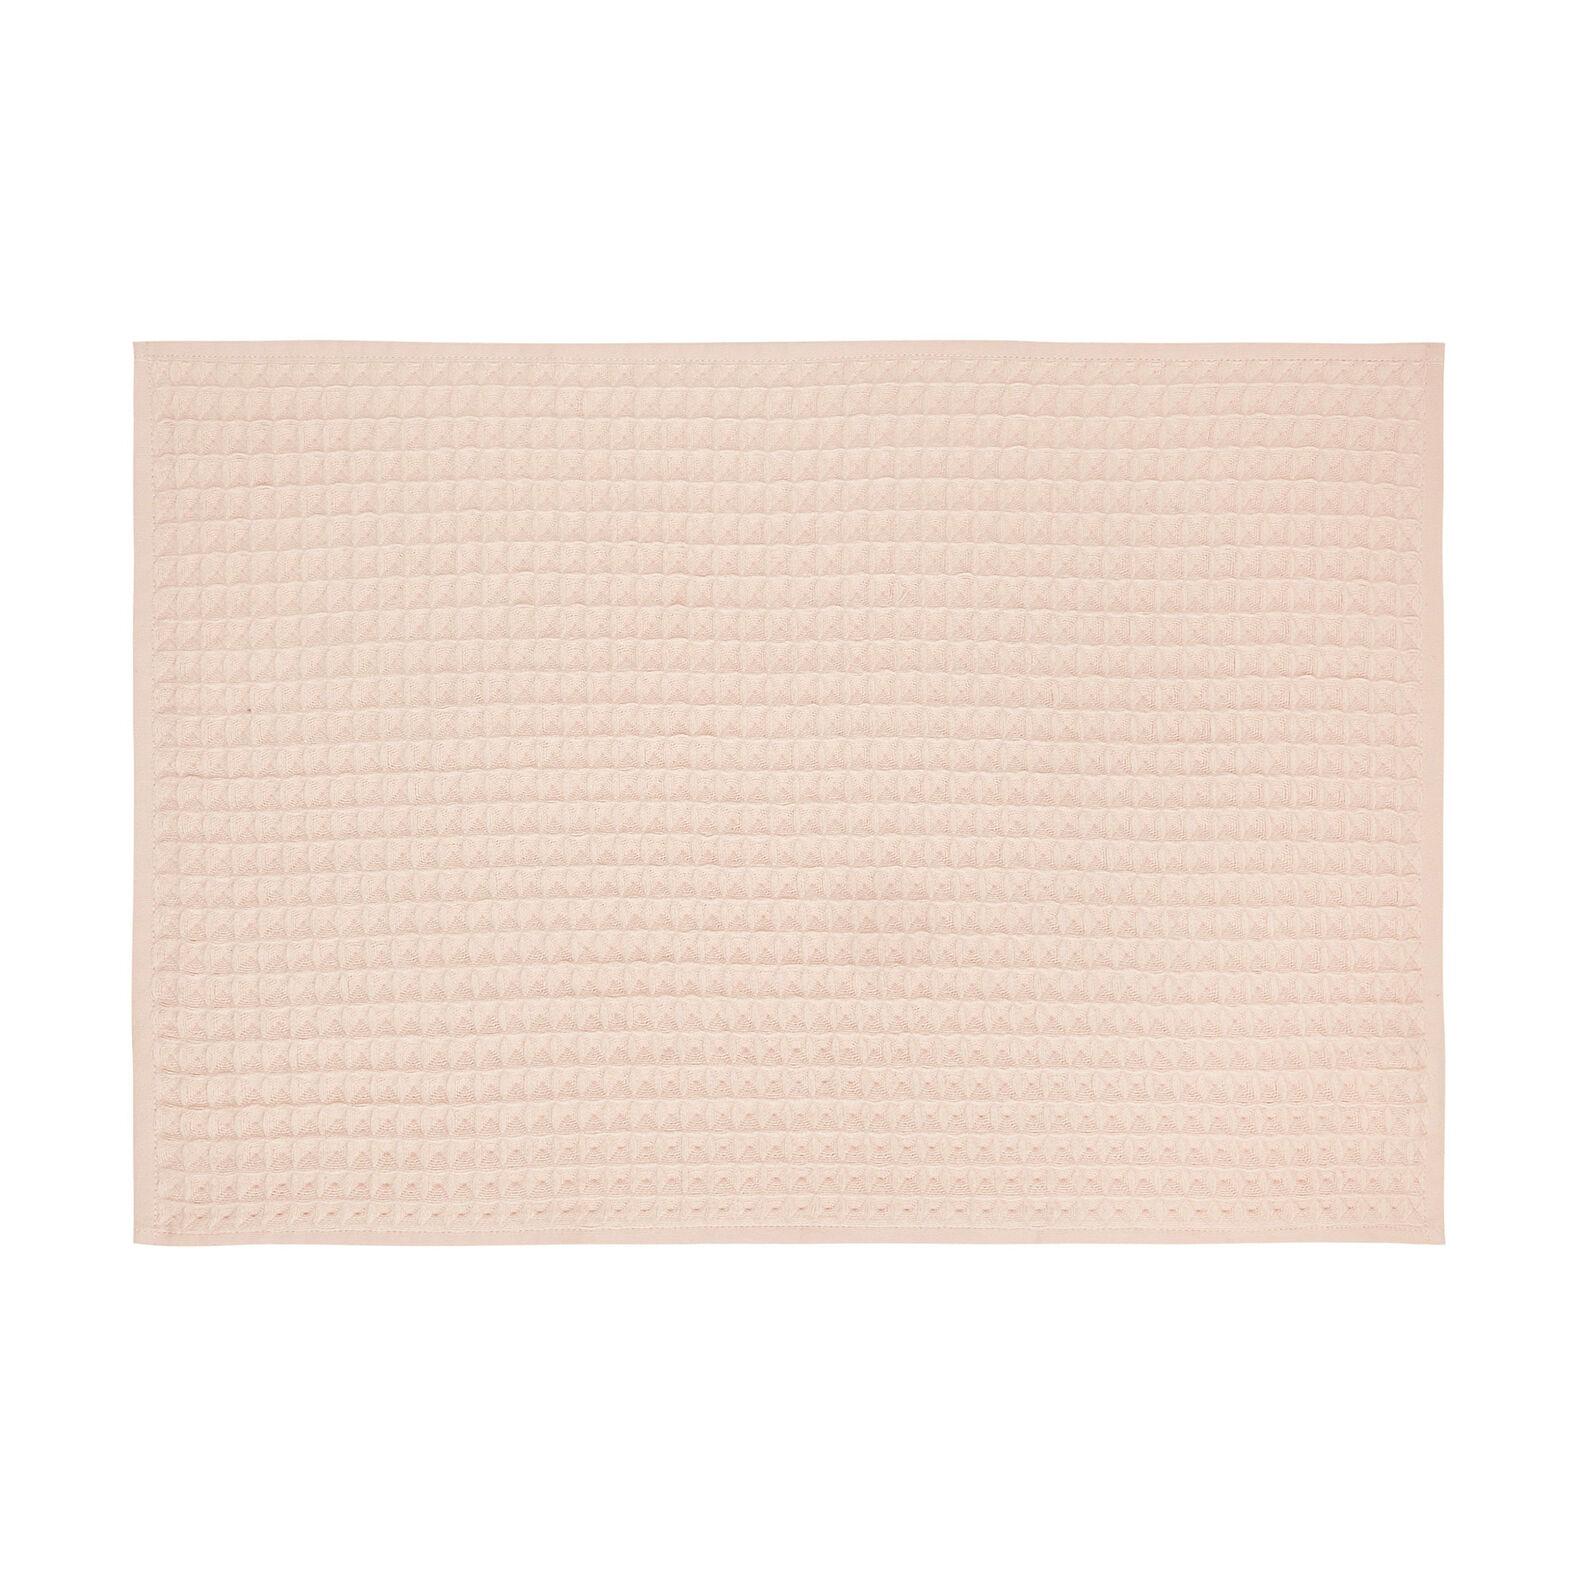 Pure cotton waffle weave towel set